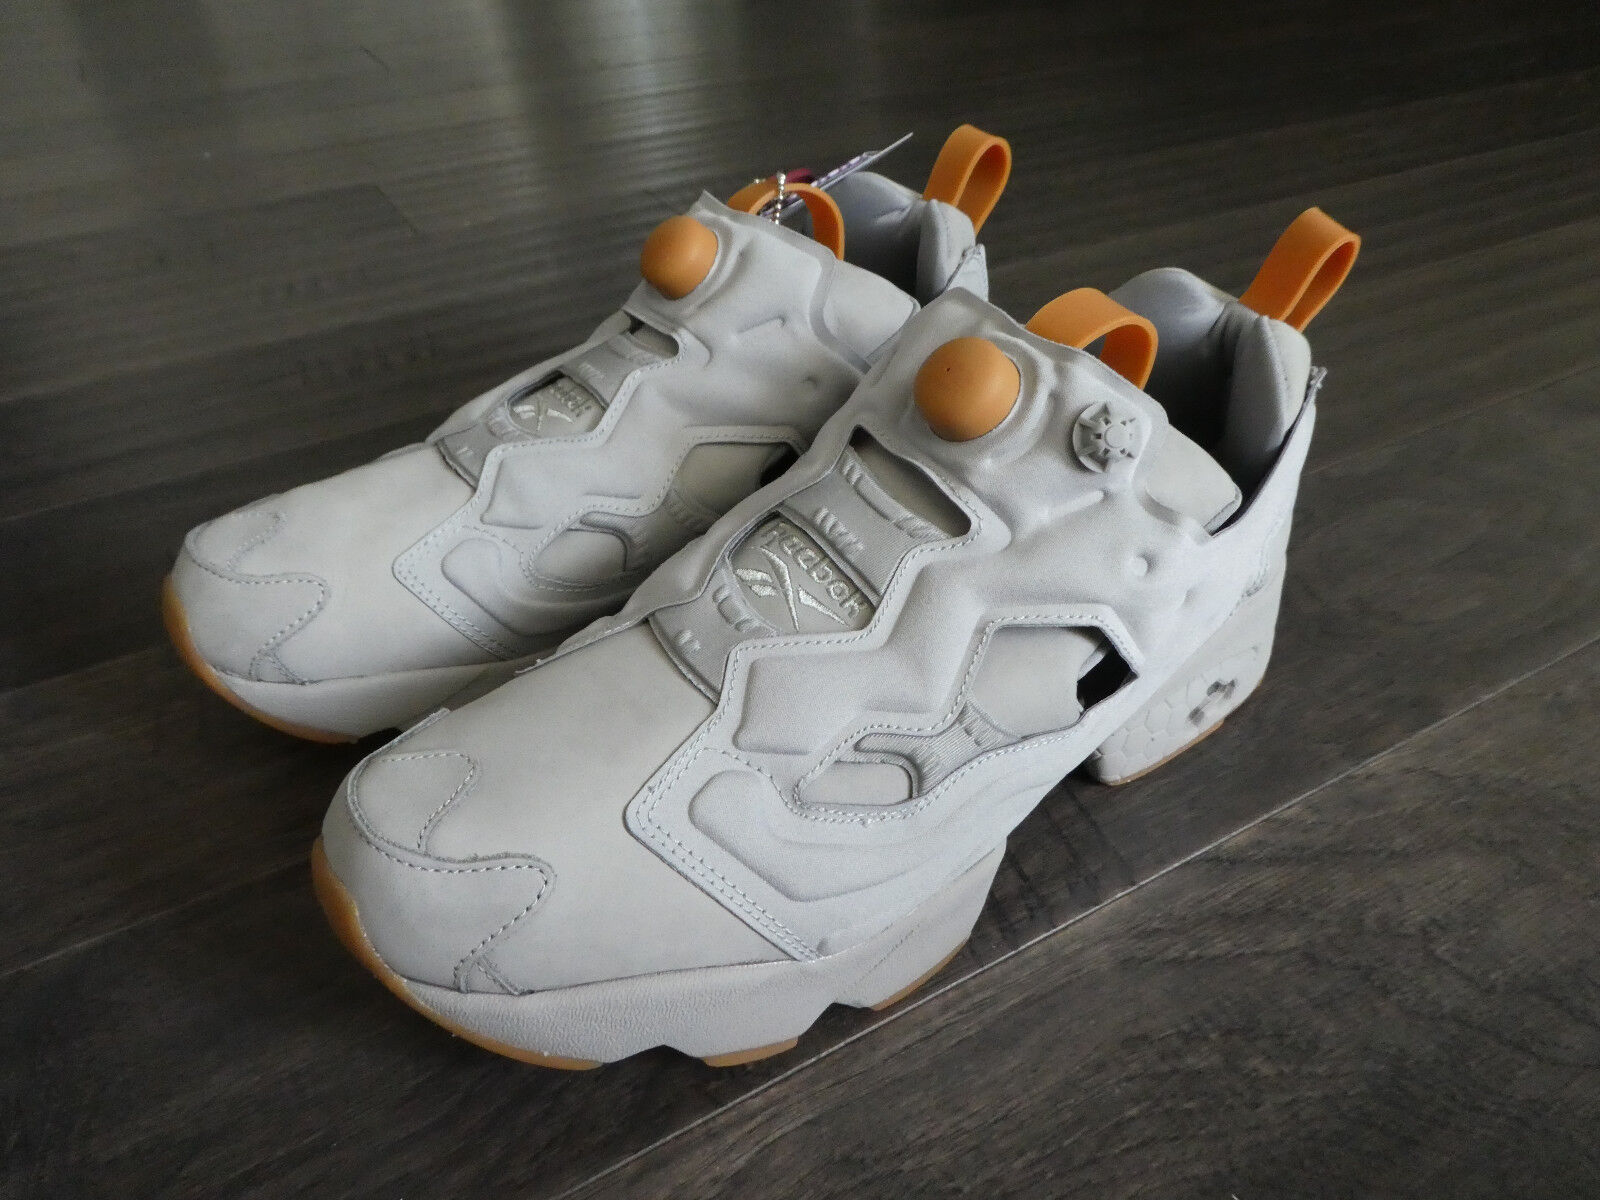 Reebok Instapump Fury OG Nubuck x Packer shoes sneakers men's new AR3500 Pump